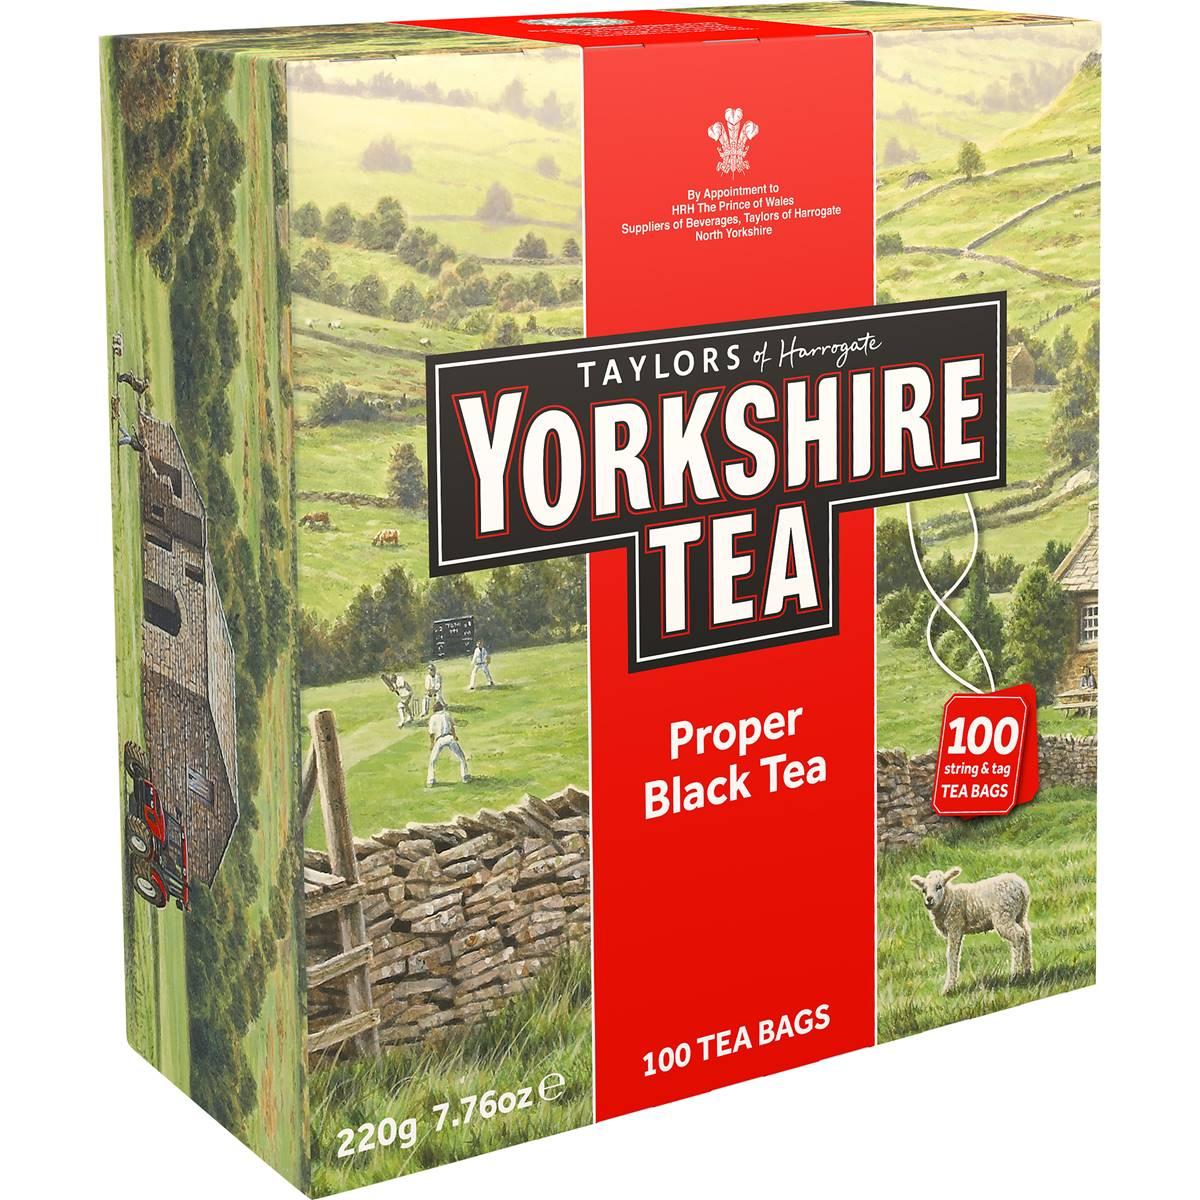 Taylors Of Harrogate Yorkshire Tea Bags